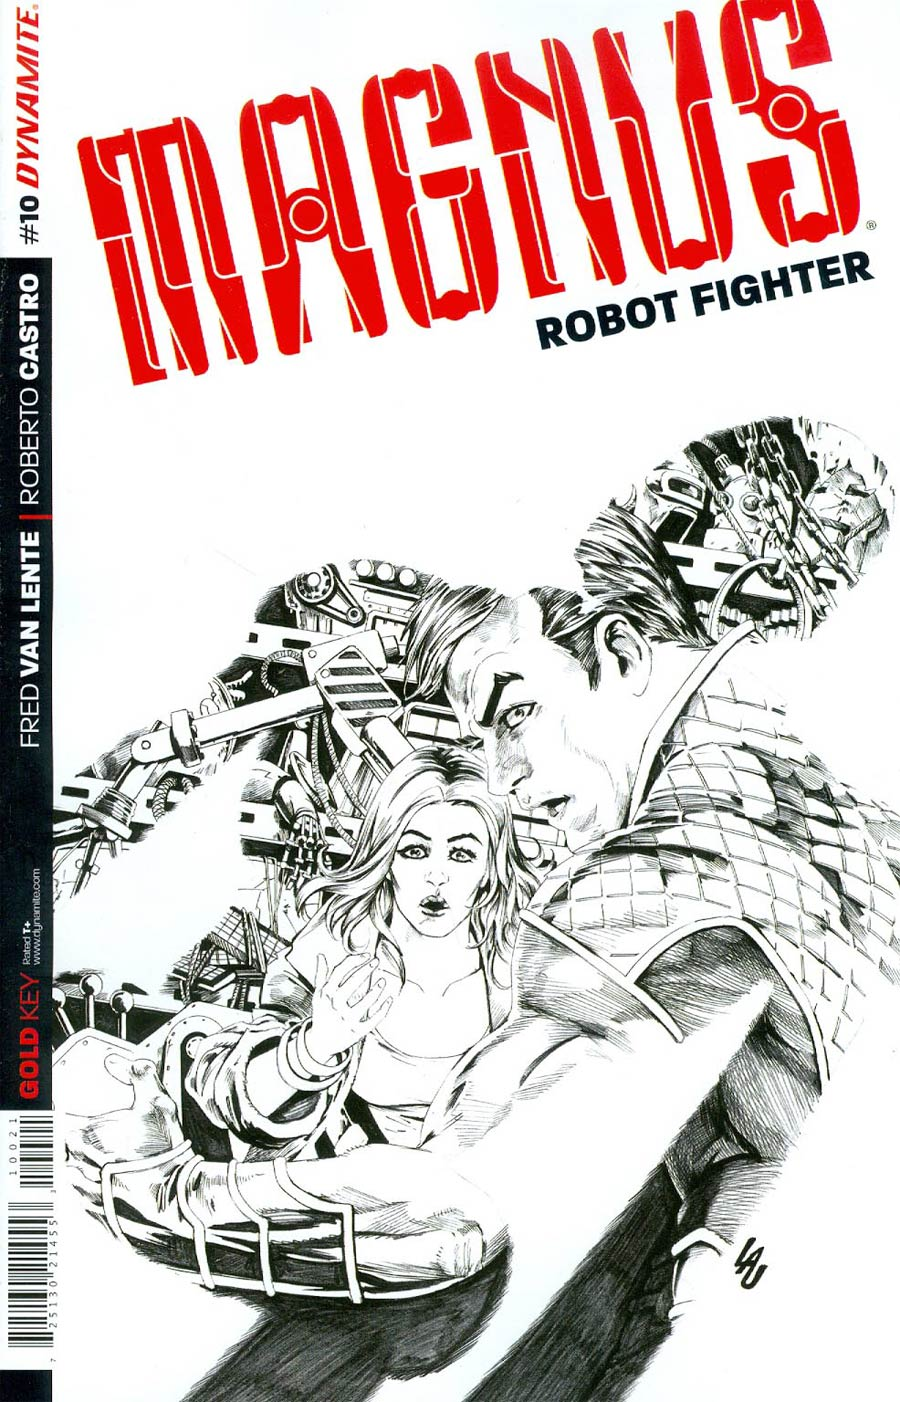 Magnus Robot Fighter Vol 4 #10 Cover C Incentive Jonathan Lau Black & White Cover